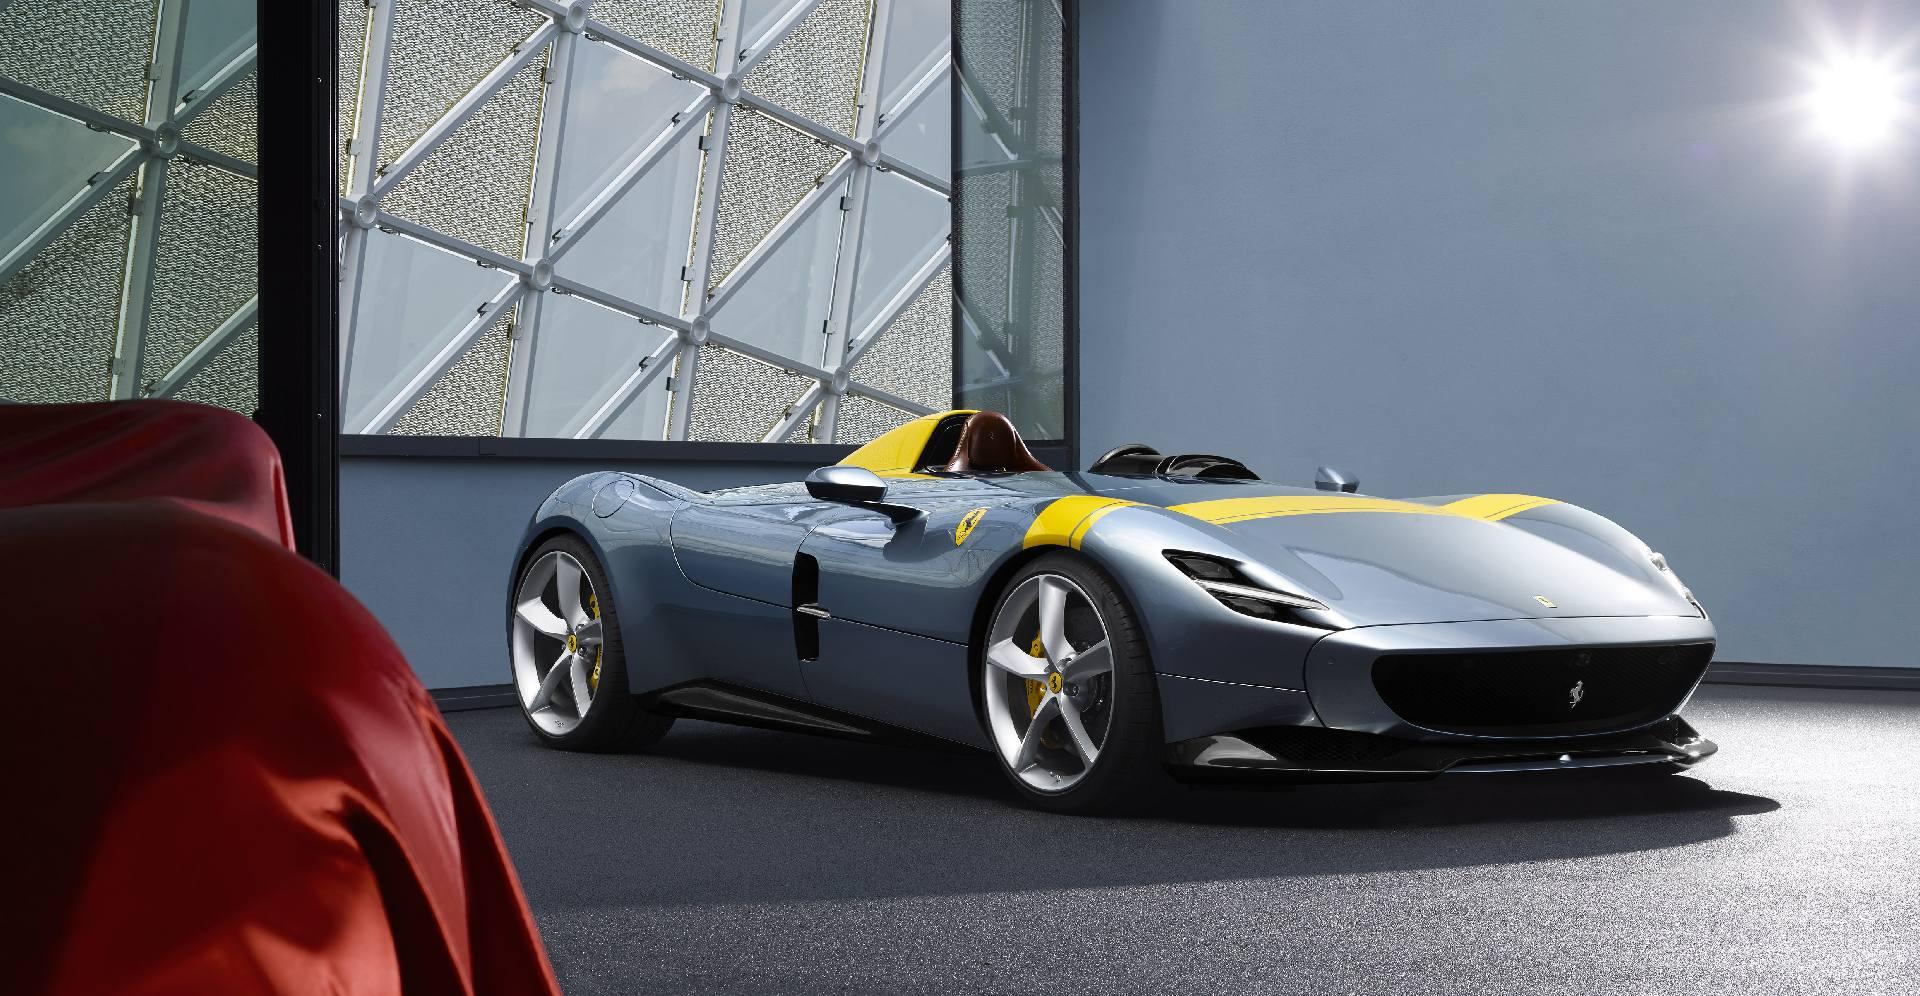 Limited Edition Ferrari Monza Sp1 And Sp2 Models Revealed Gtspirit